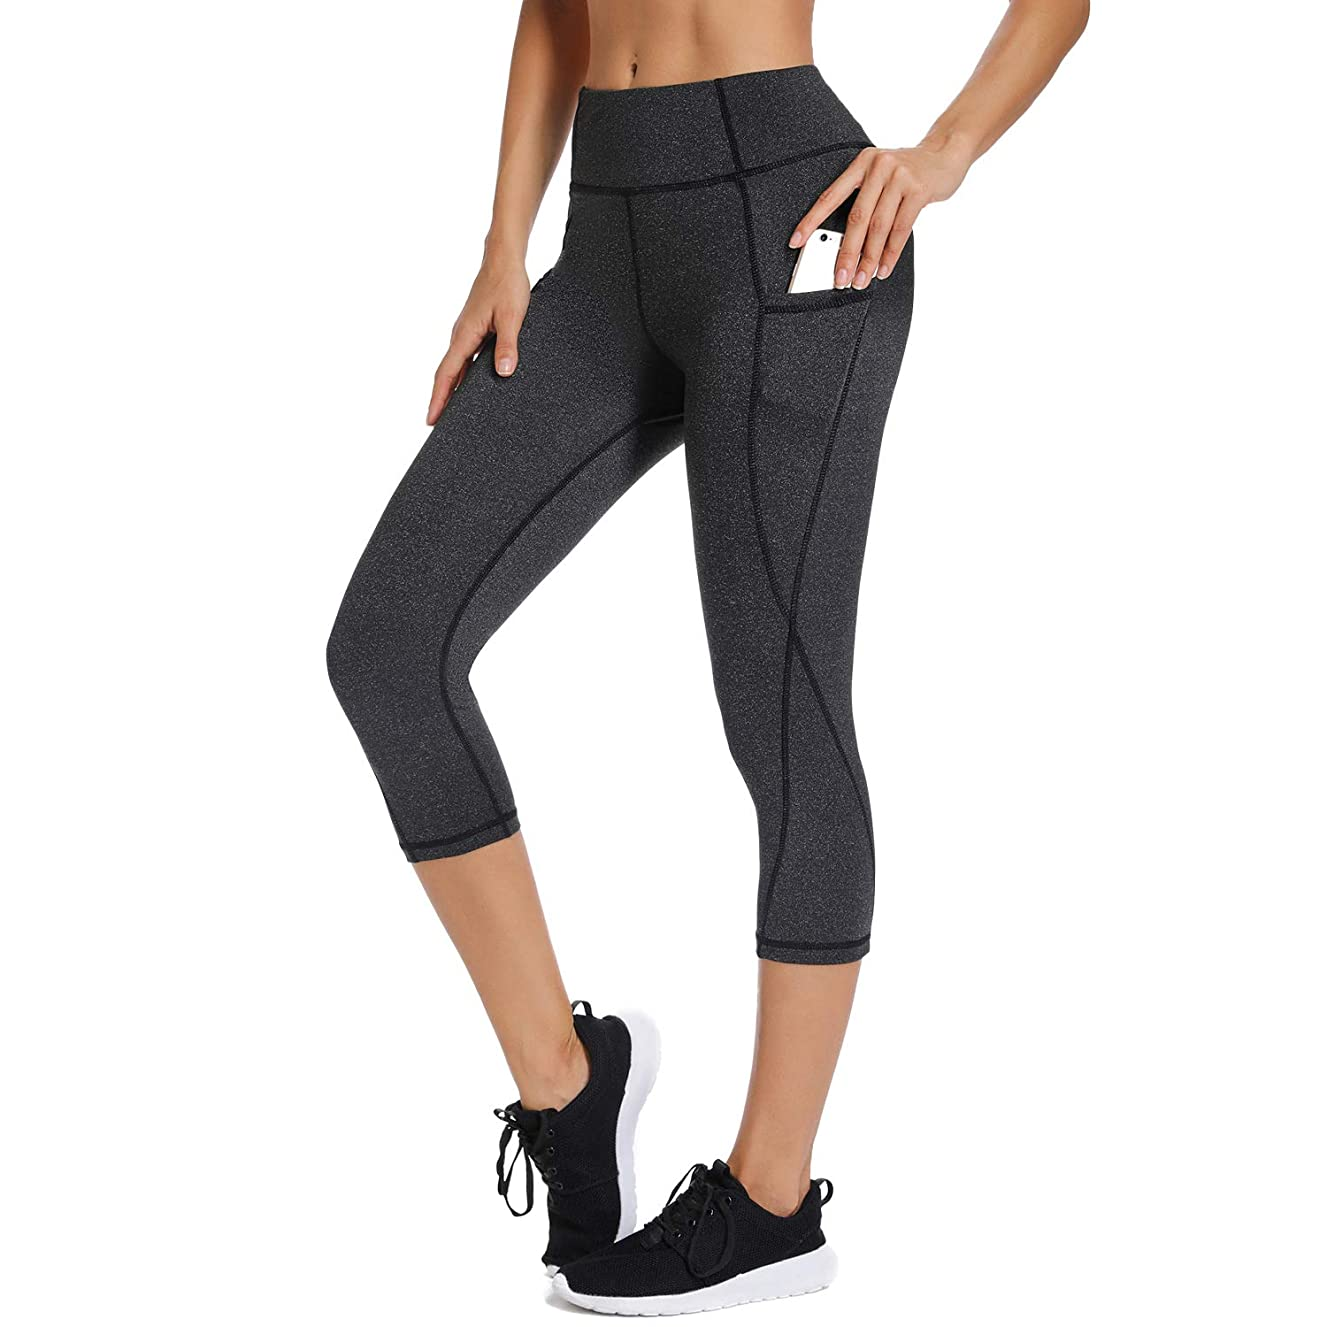 FITTOO Womens High Waisted Athletic Capri Leggings Side Pockets Yoga Pants Tummy Control